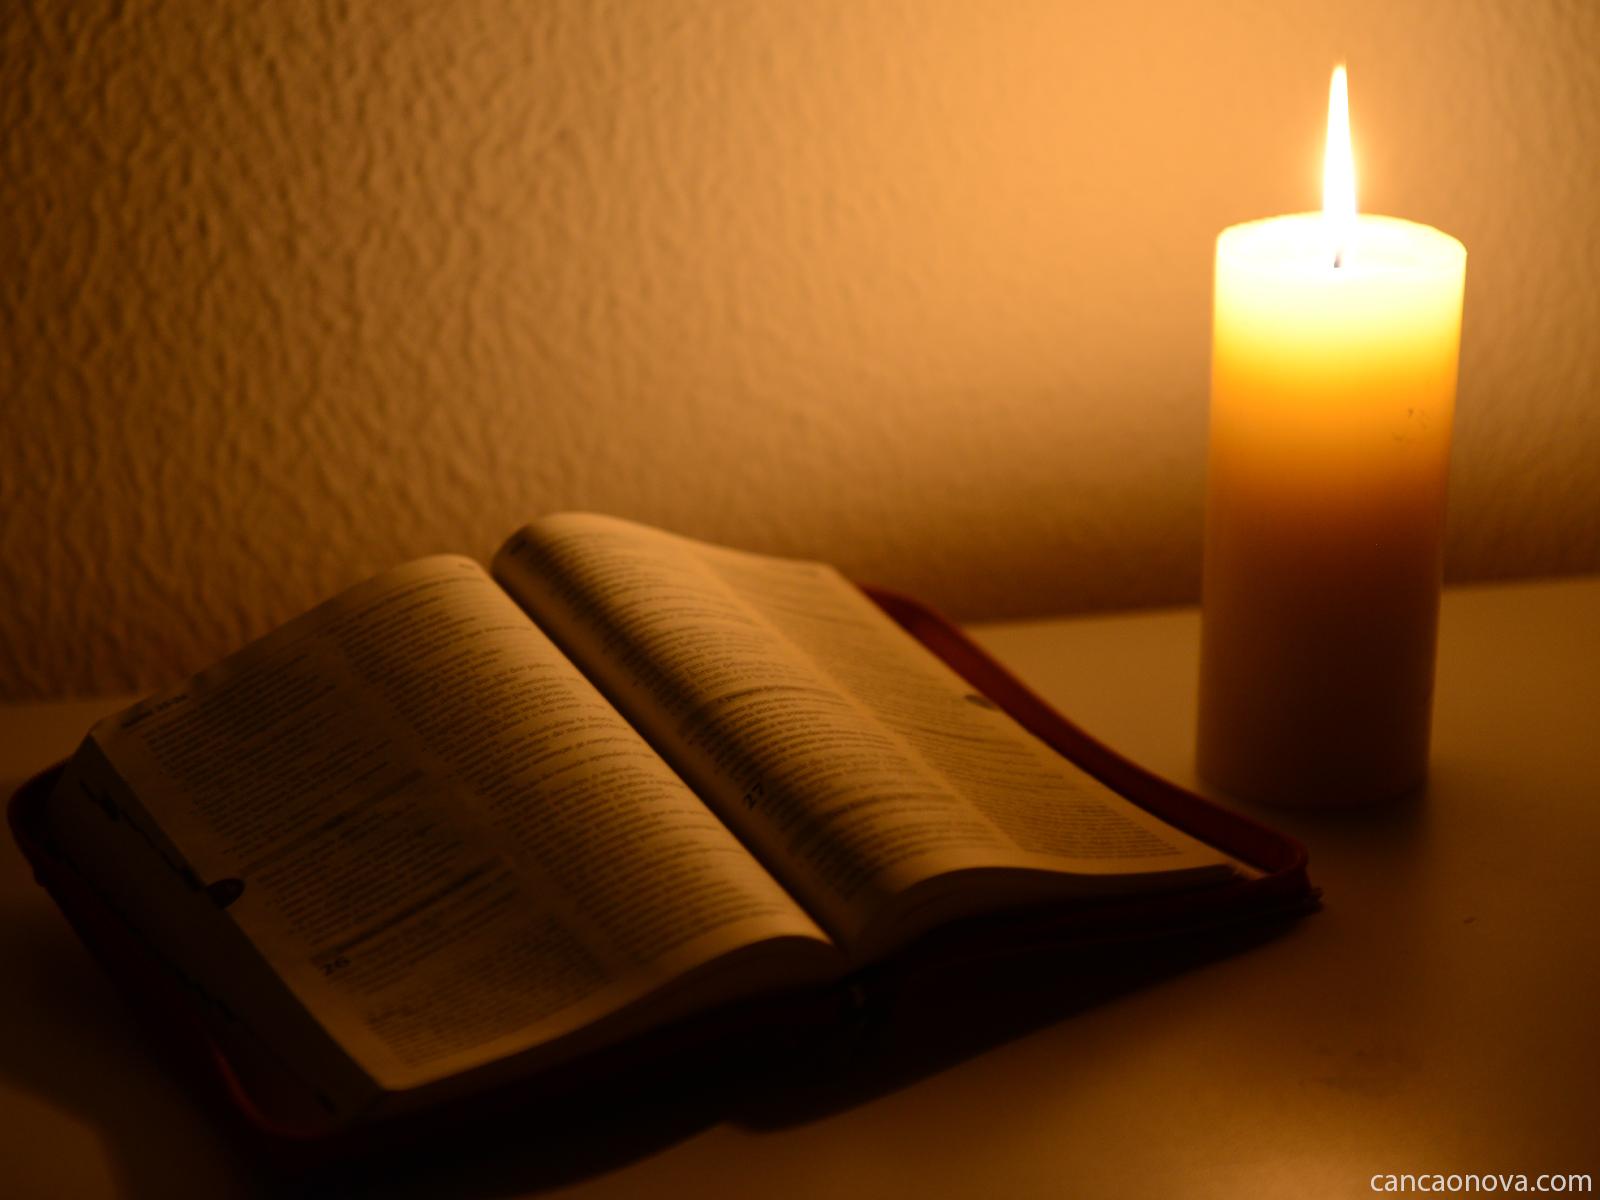 Bíblia, fonte de espiritualidade